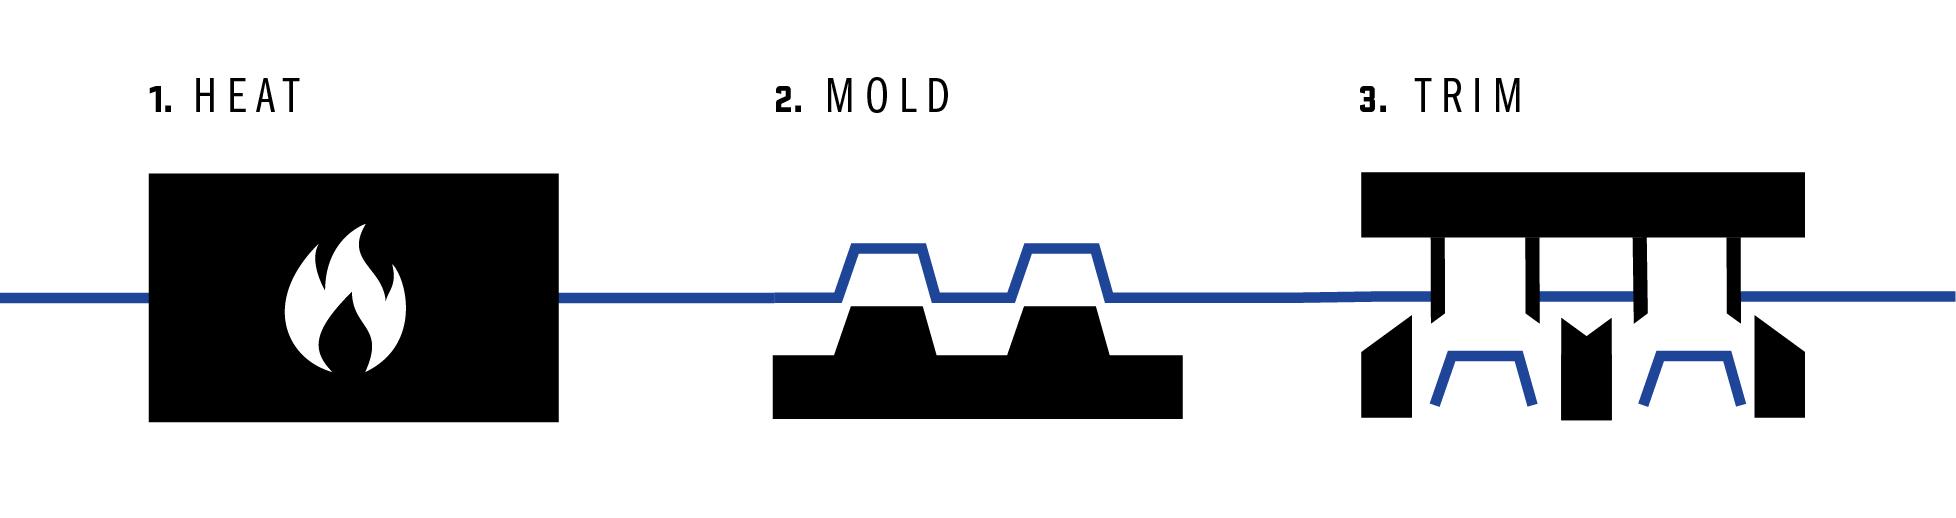 CustomFab Thermoforming Process